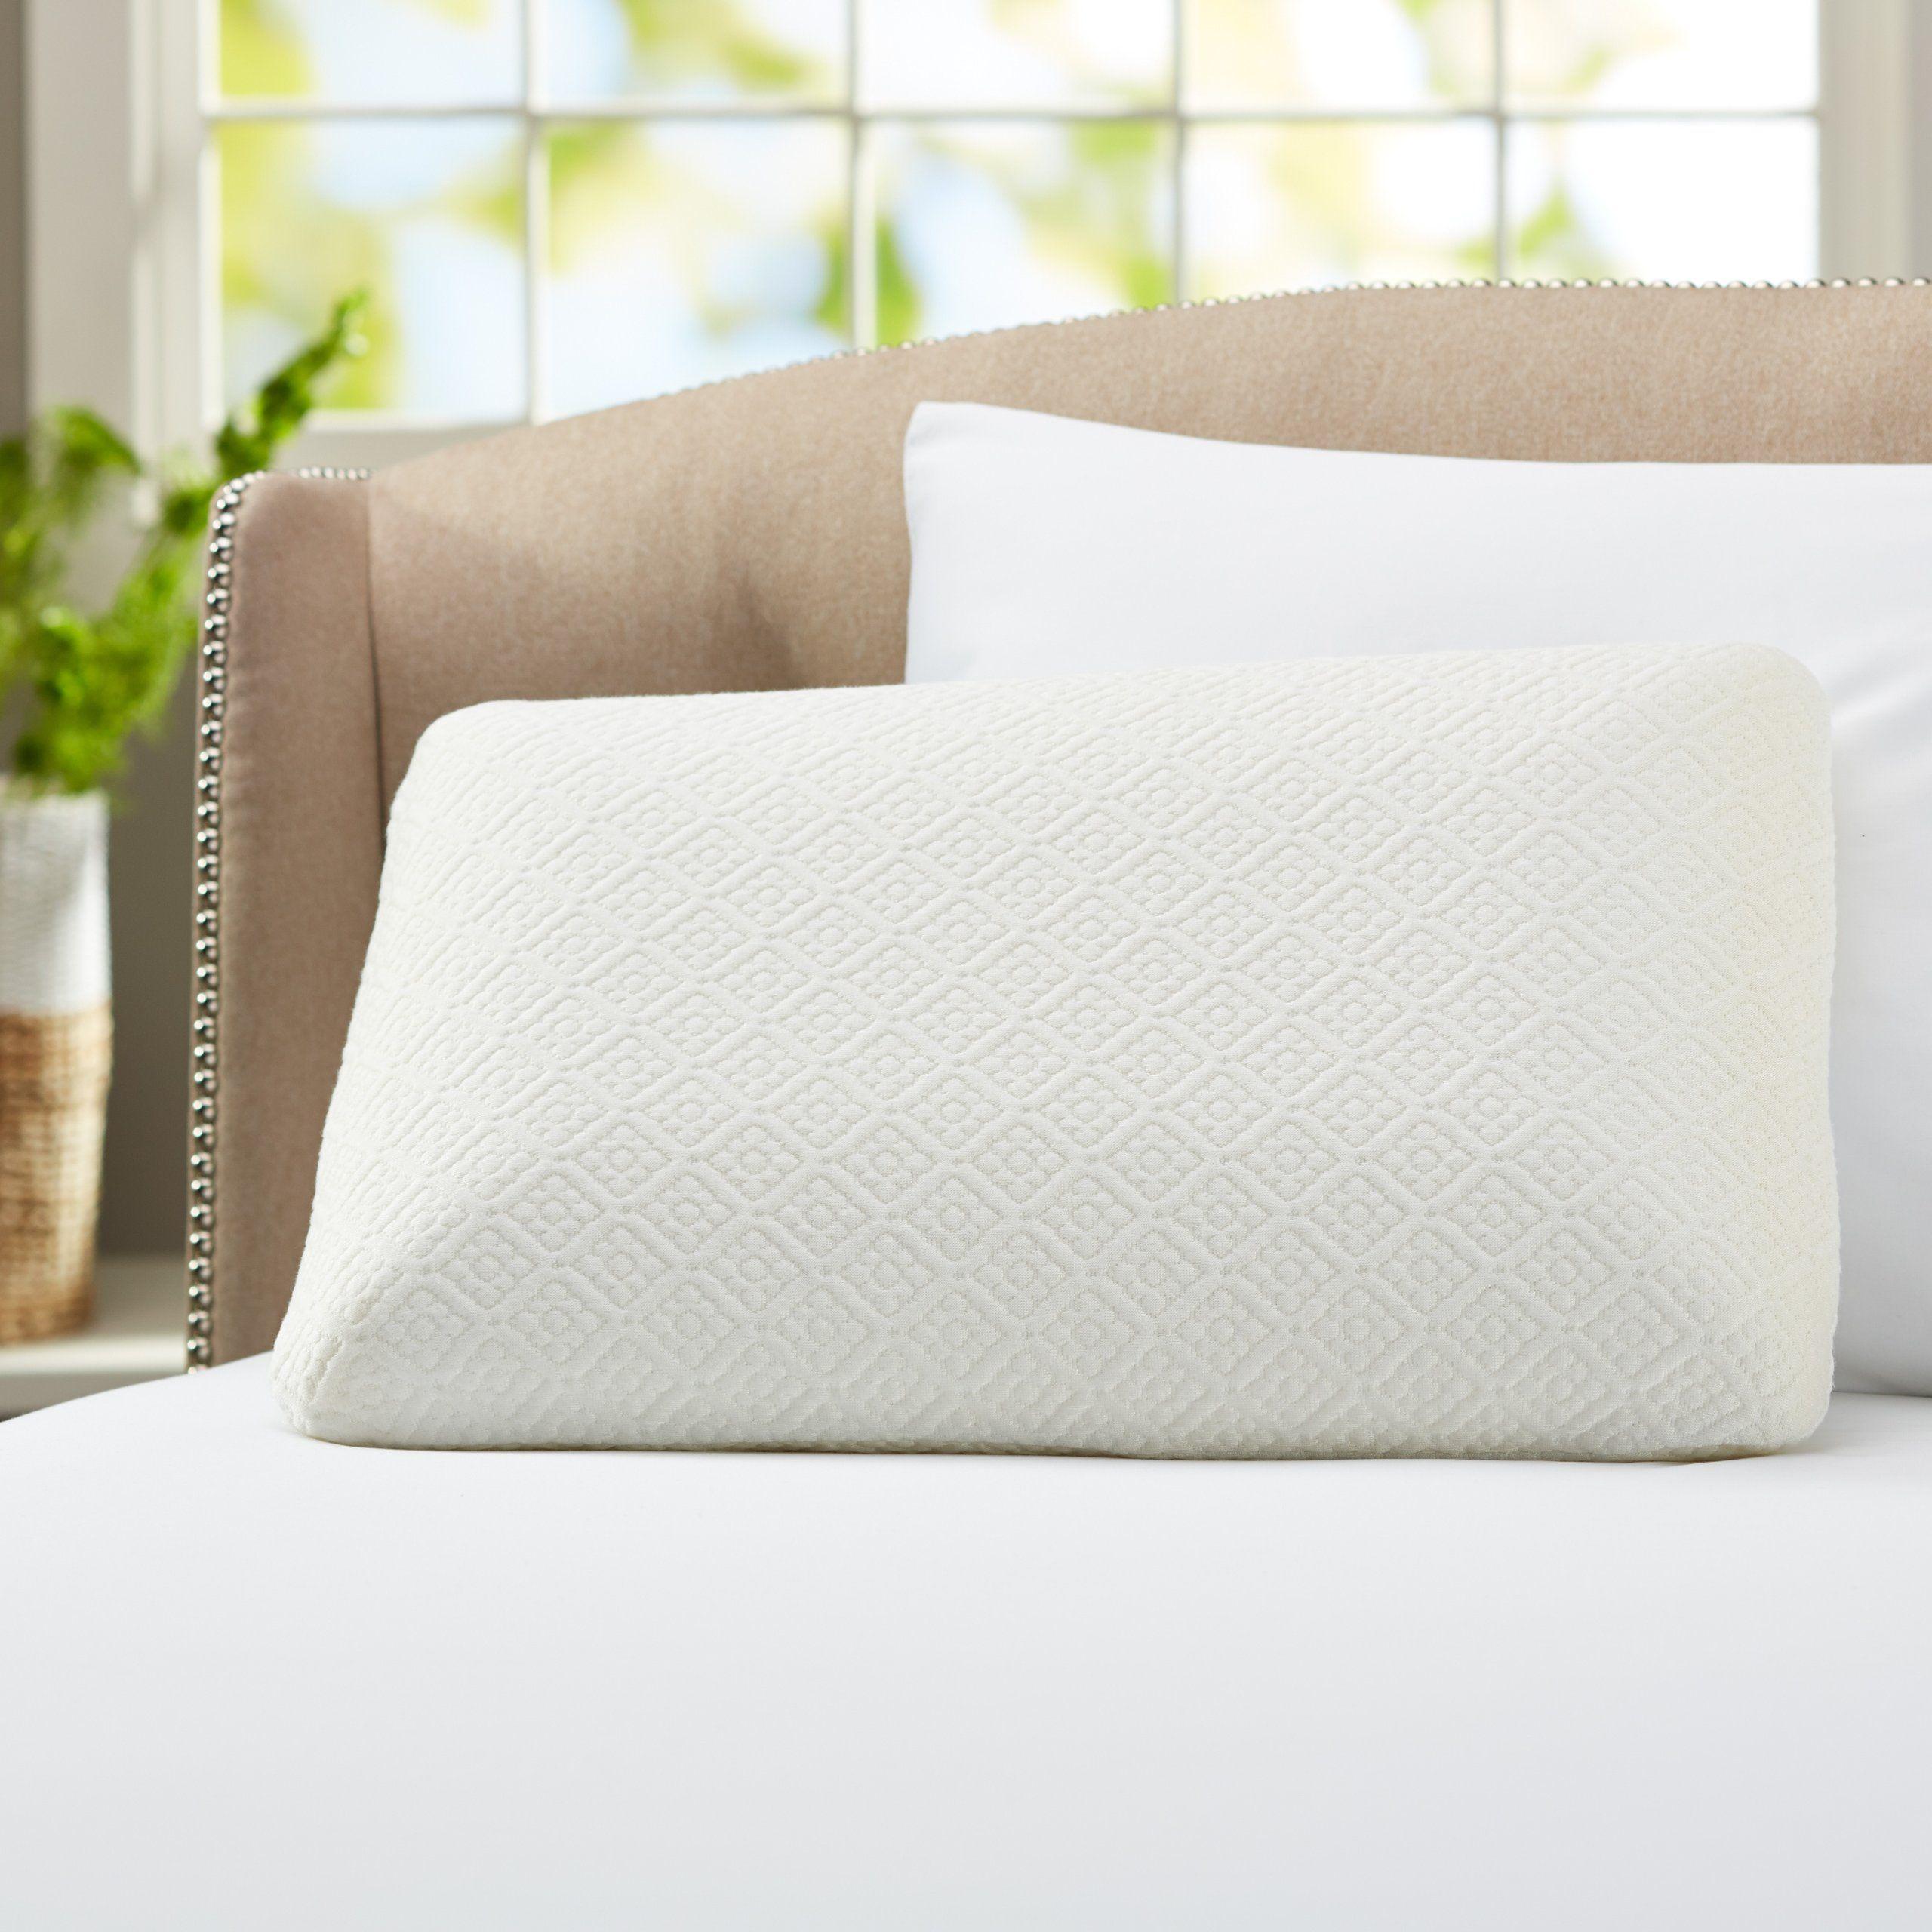 Amazon Com Pinzon Classic Memory Foam Pillow Bedding Bath